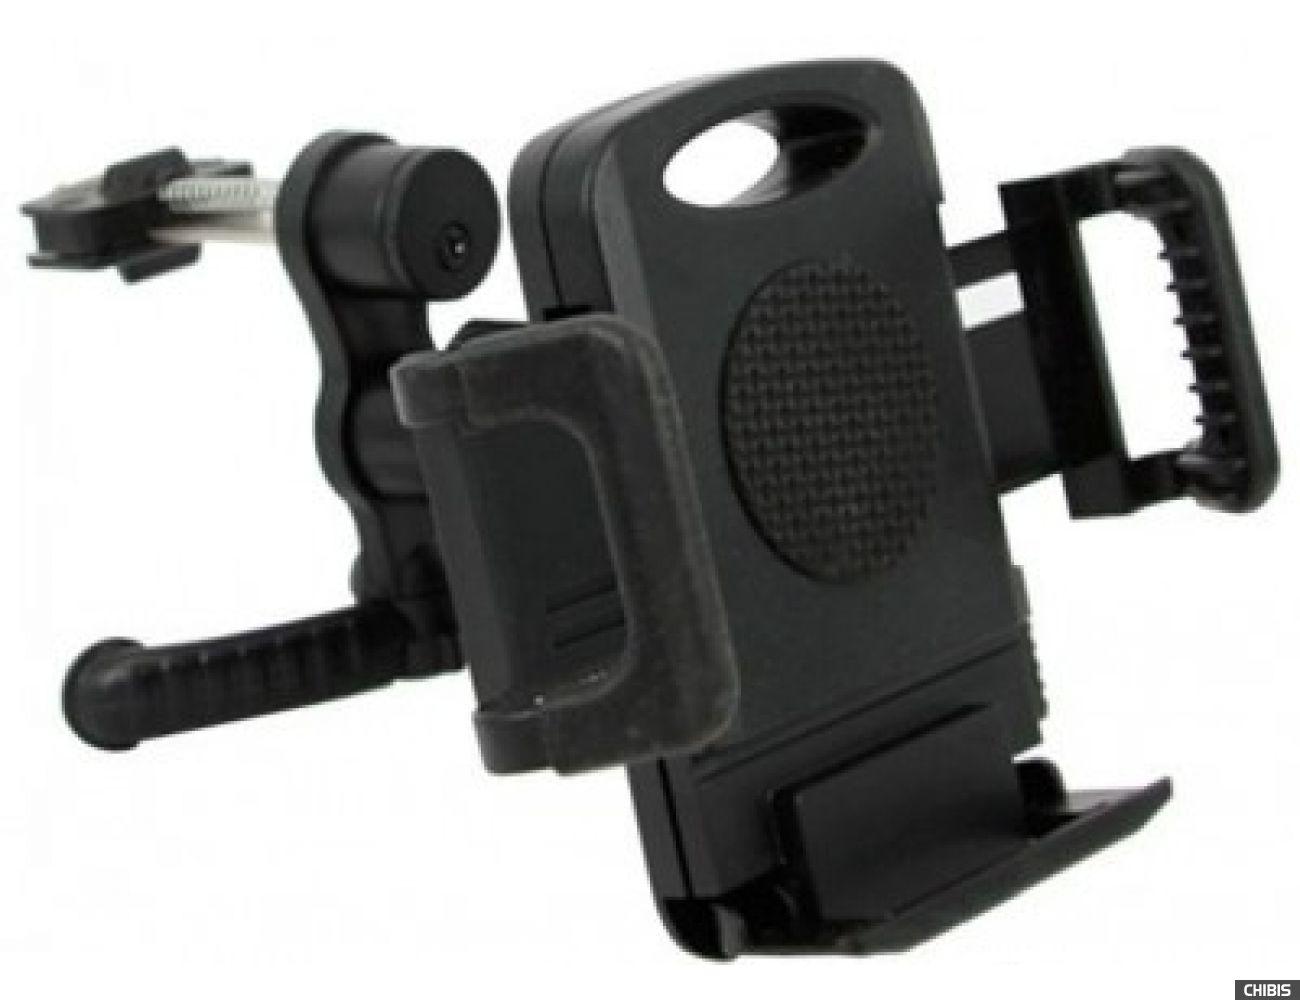 Автодержатель на решетку обдува GlobalHold M01GH для смартфонов